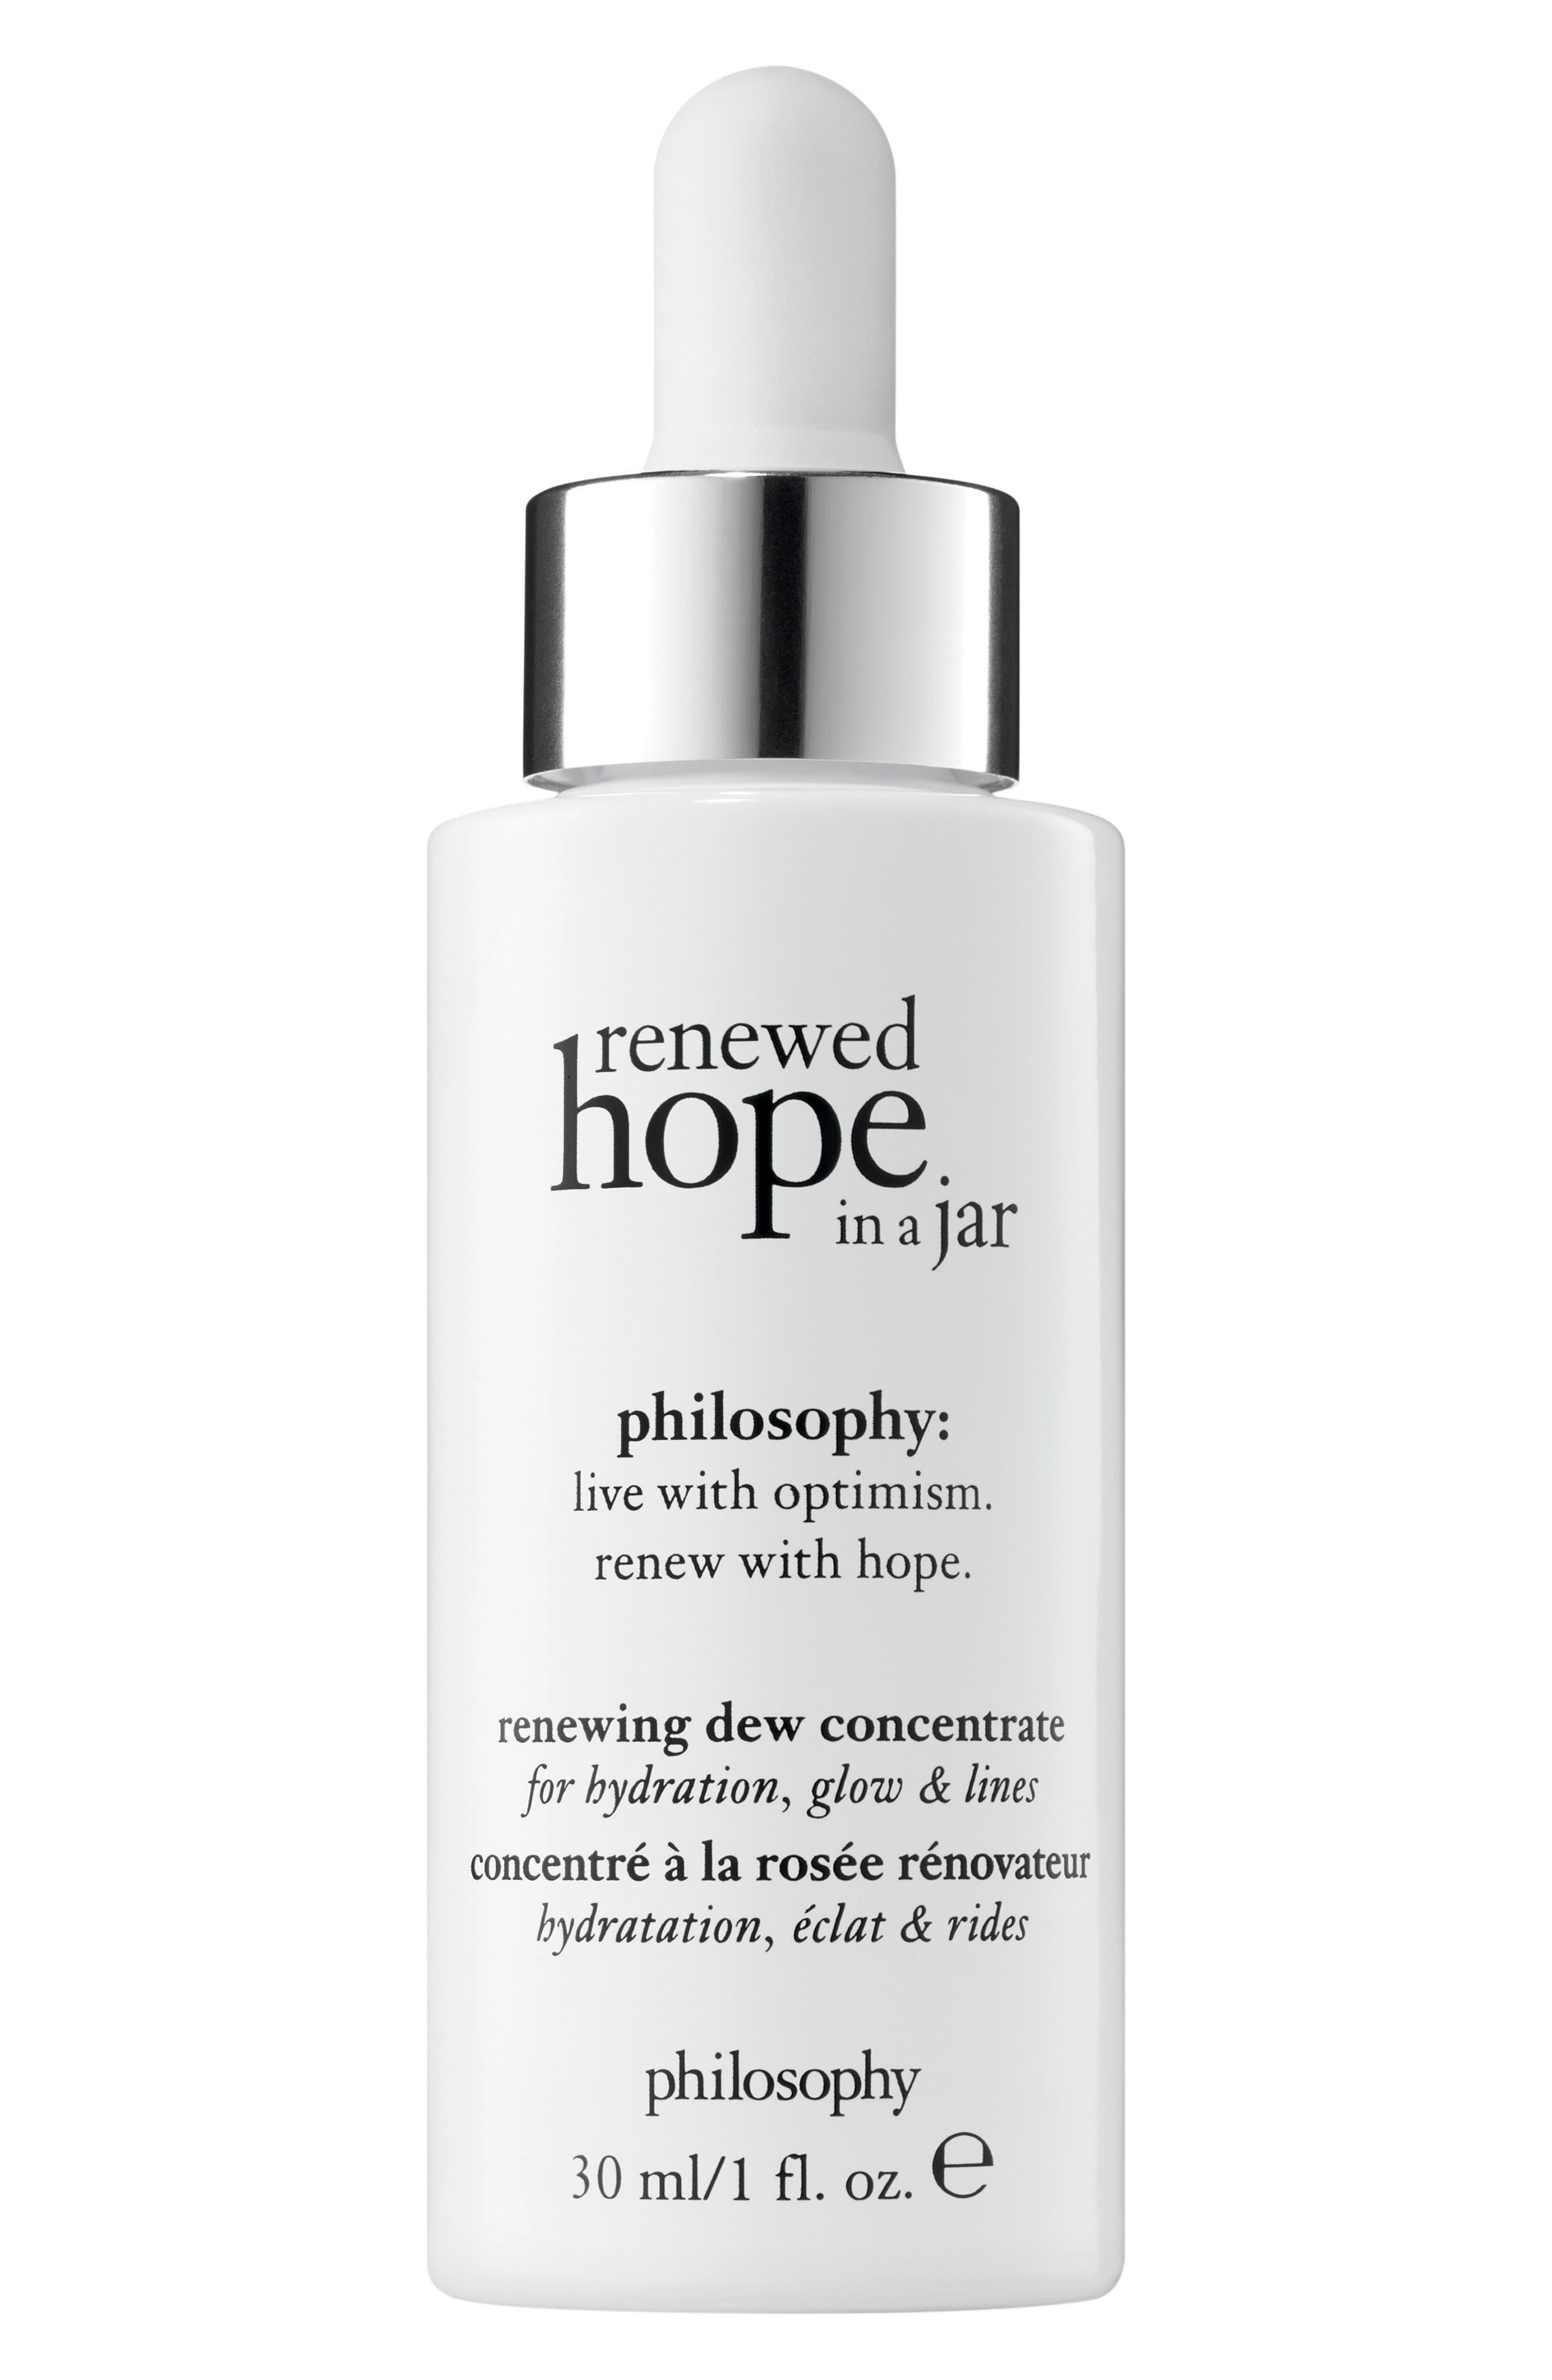 PHILOSOPHY renewed hope in a jar renewing dew concentrate, Main, color, NO COLOR